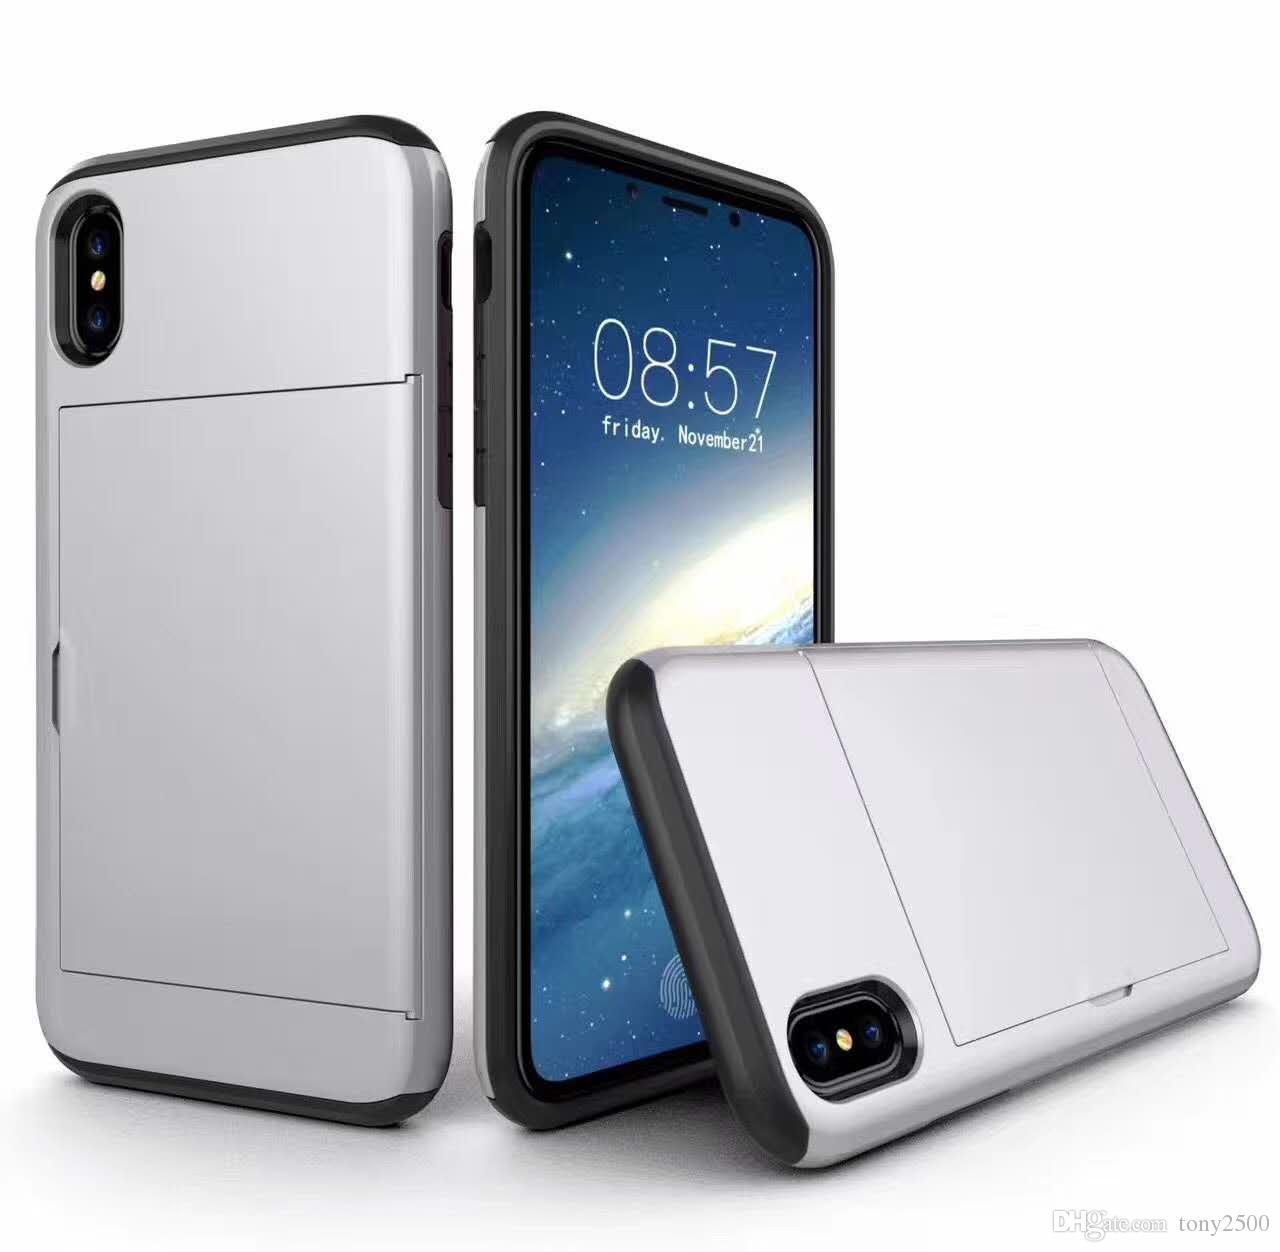 SGP spigen case Slide Card Slot Wallet ID Case Dual Layered -ShoAntick Protector for iPhone X S R max 8 plus 7 plus Samsung s10 s9 s8 note9